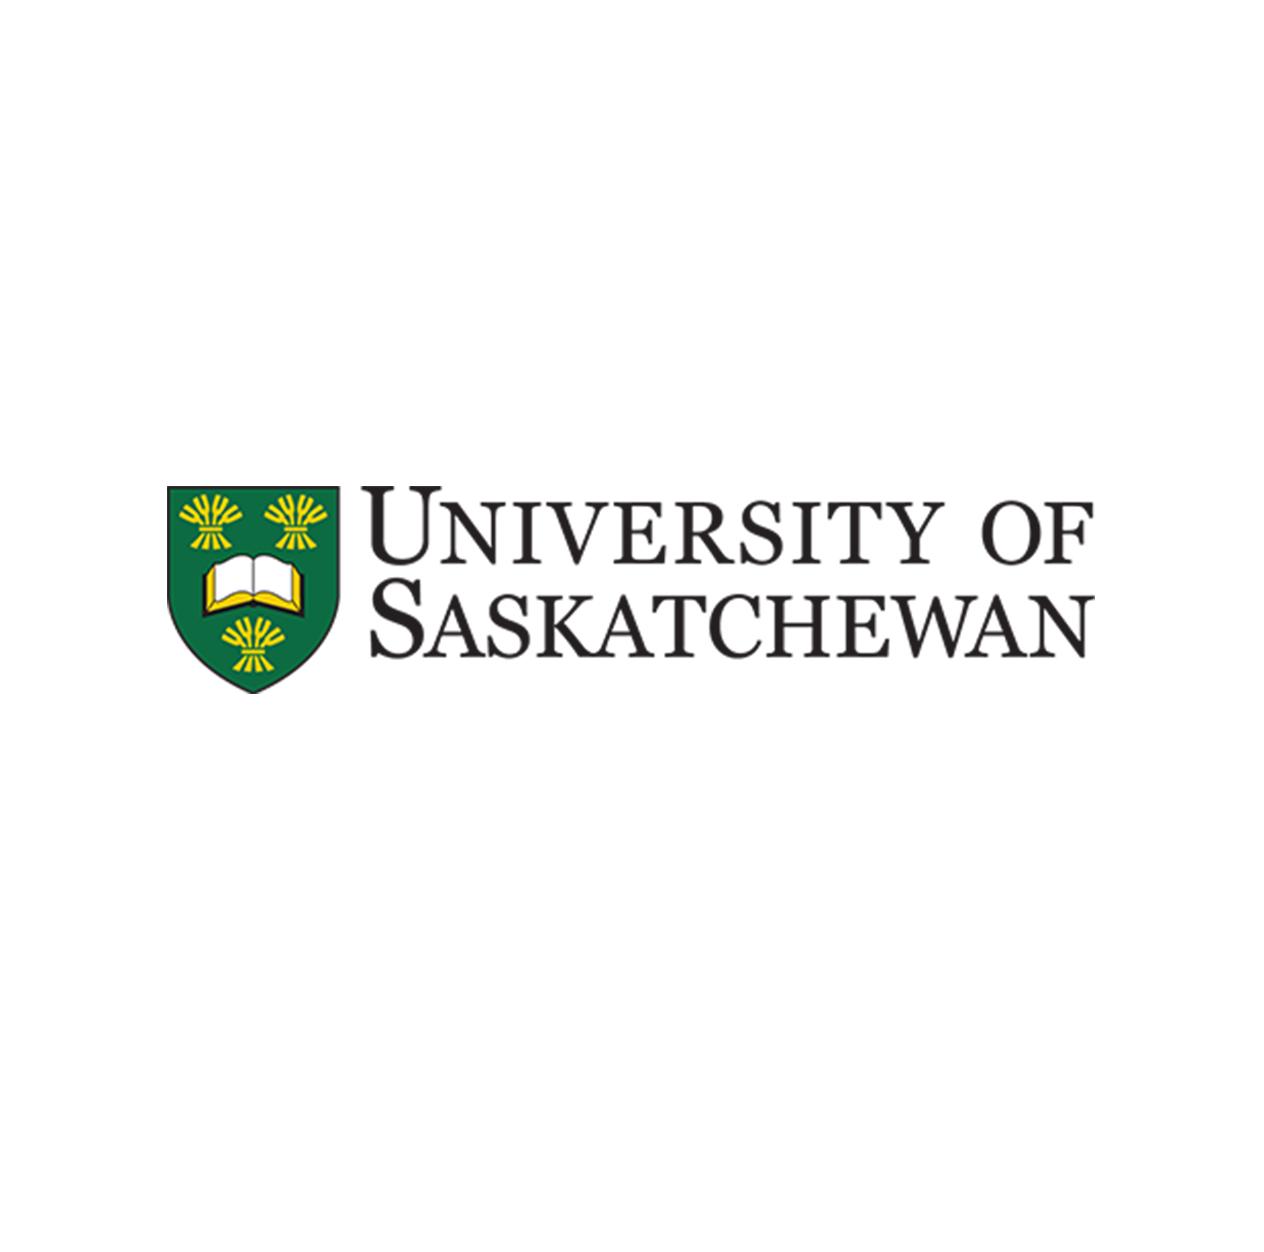 University of Saskatchewan (ccell).jpg